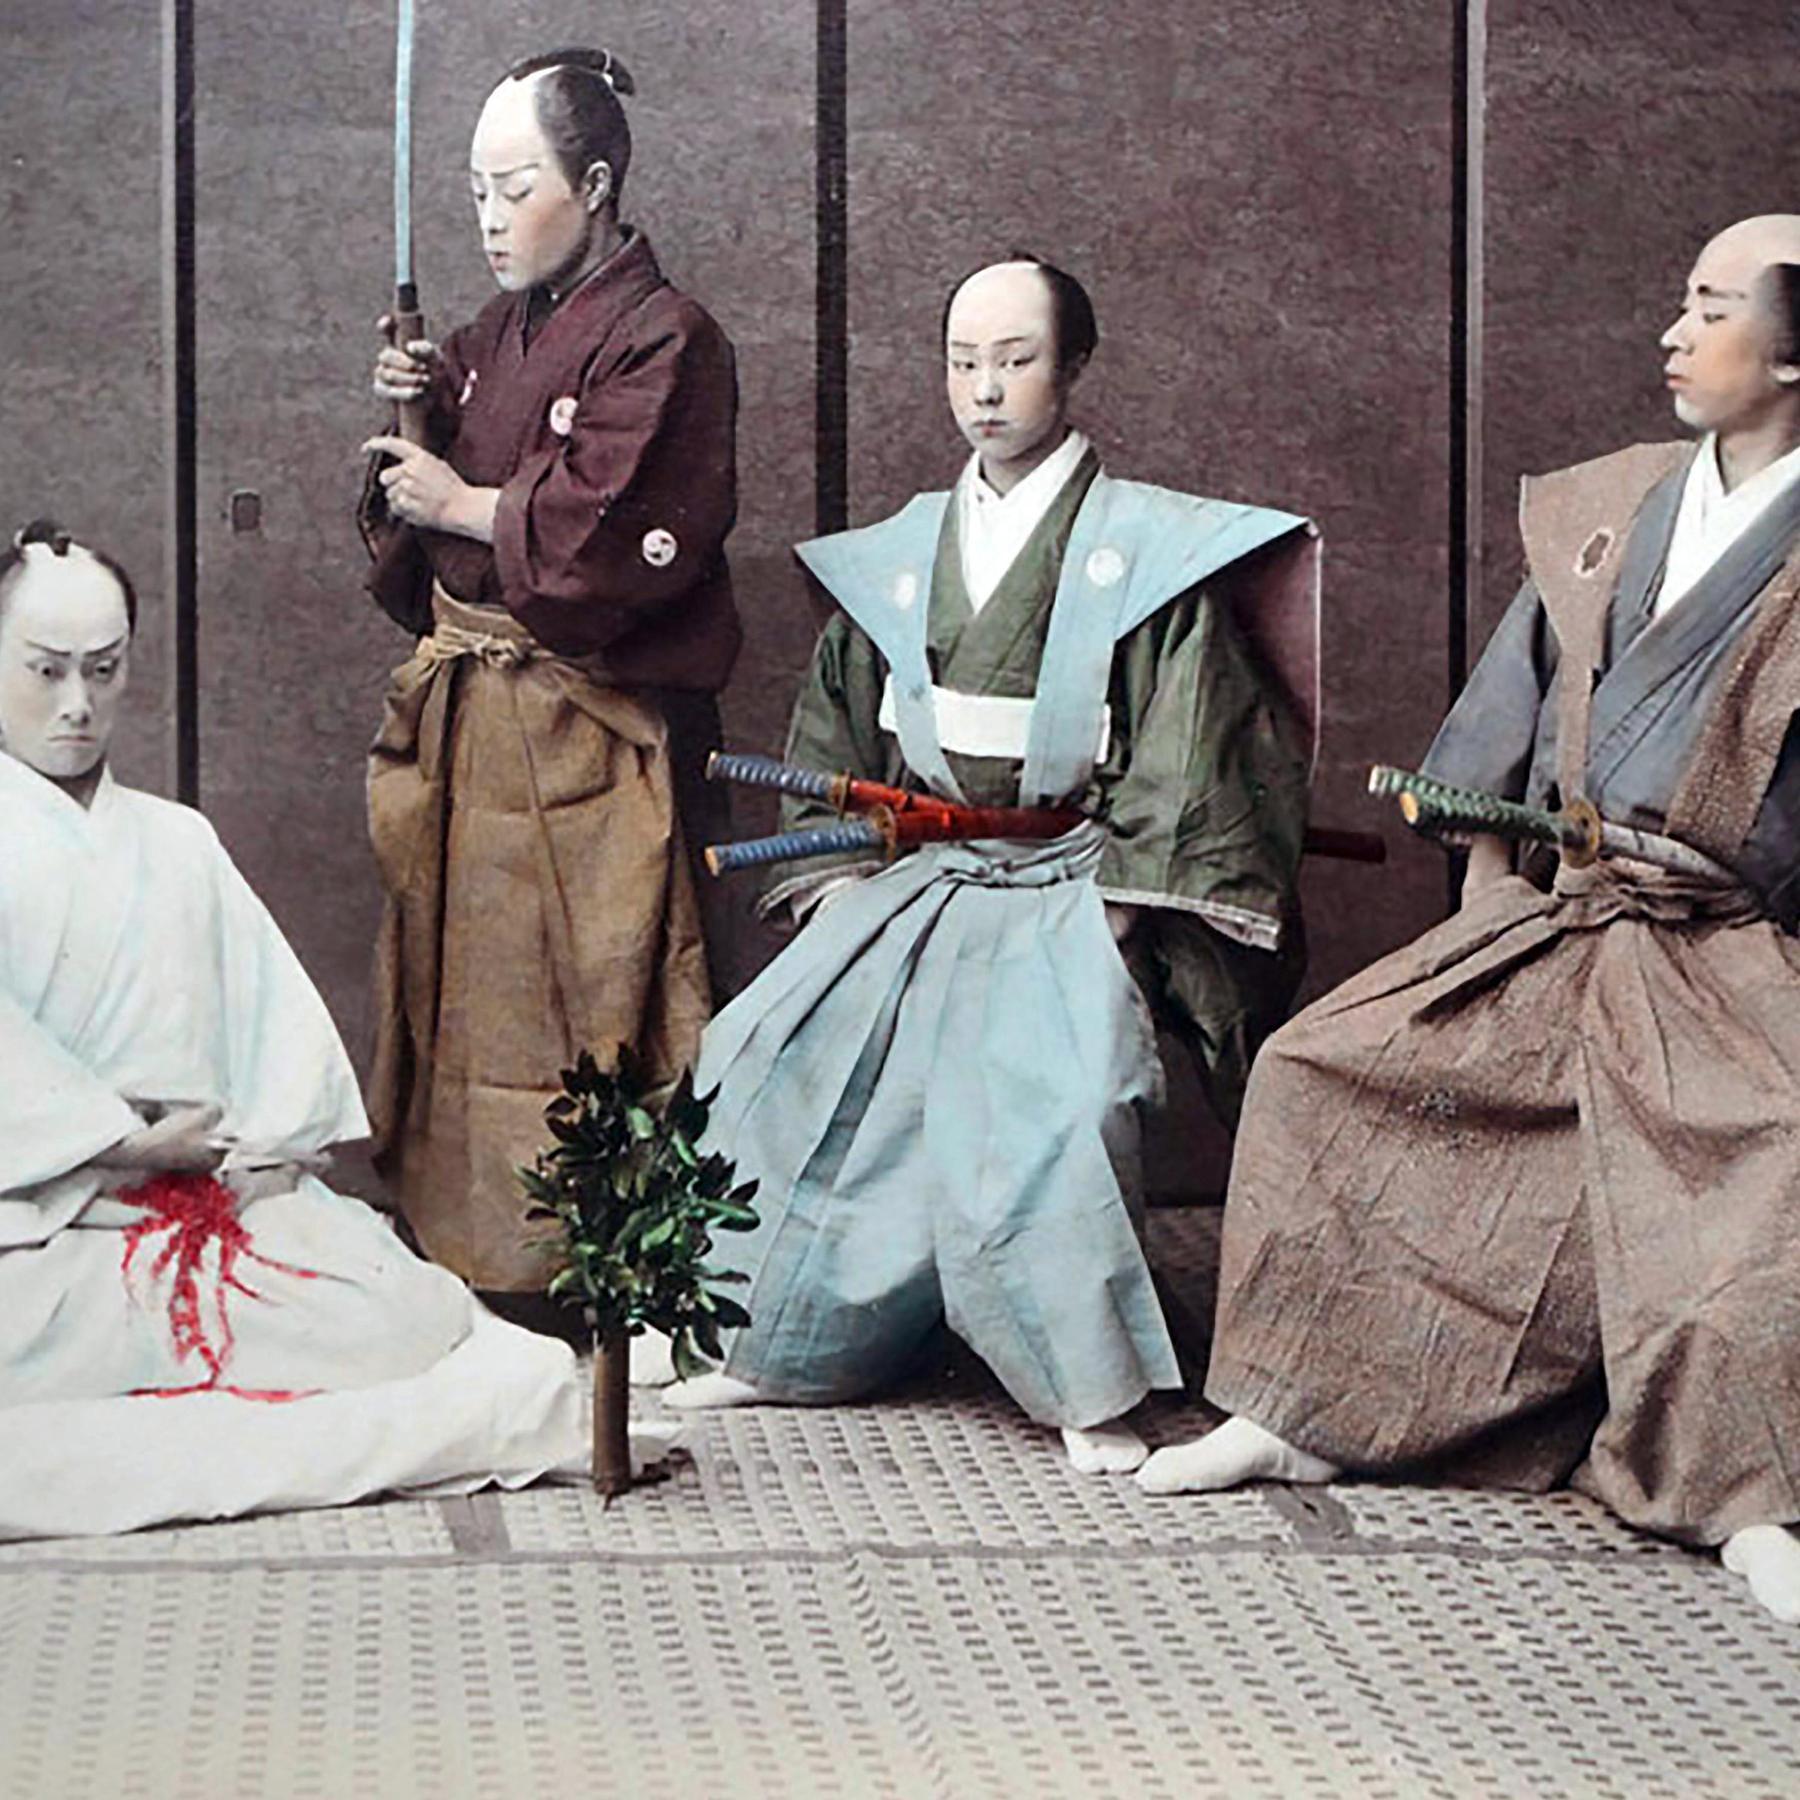 Samurai - Der legendäre Kriegeradel Japans